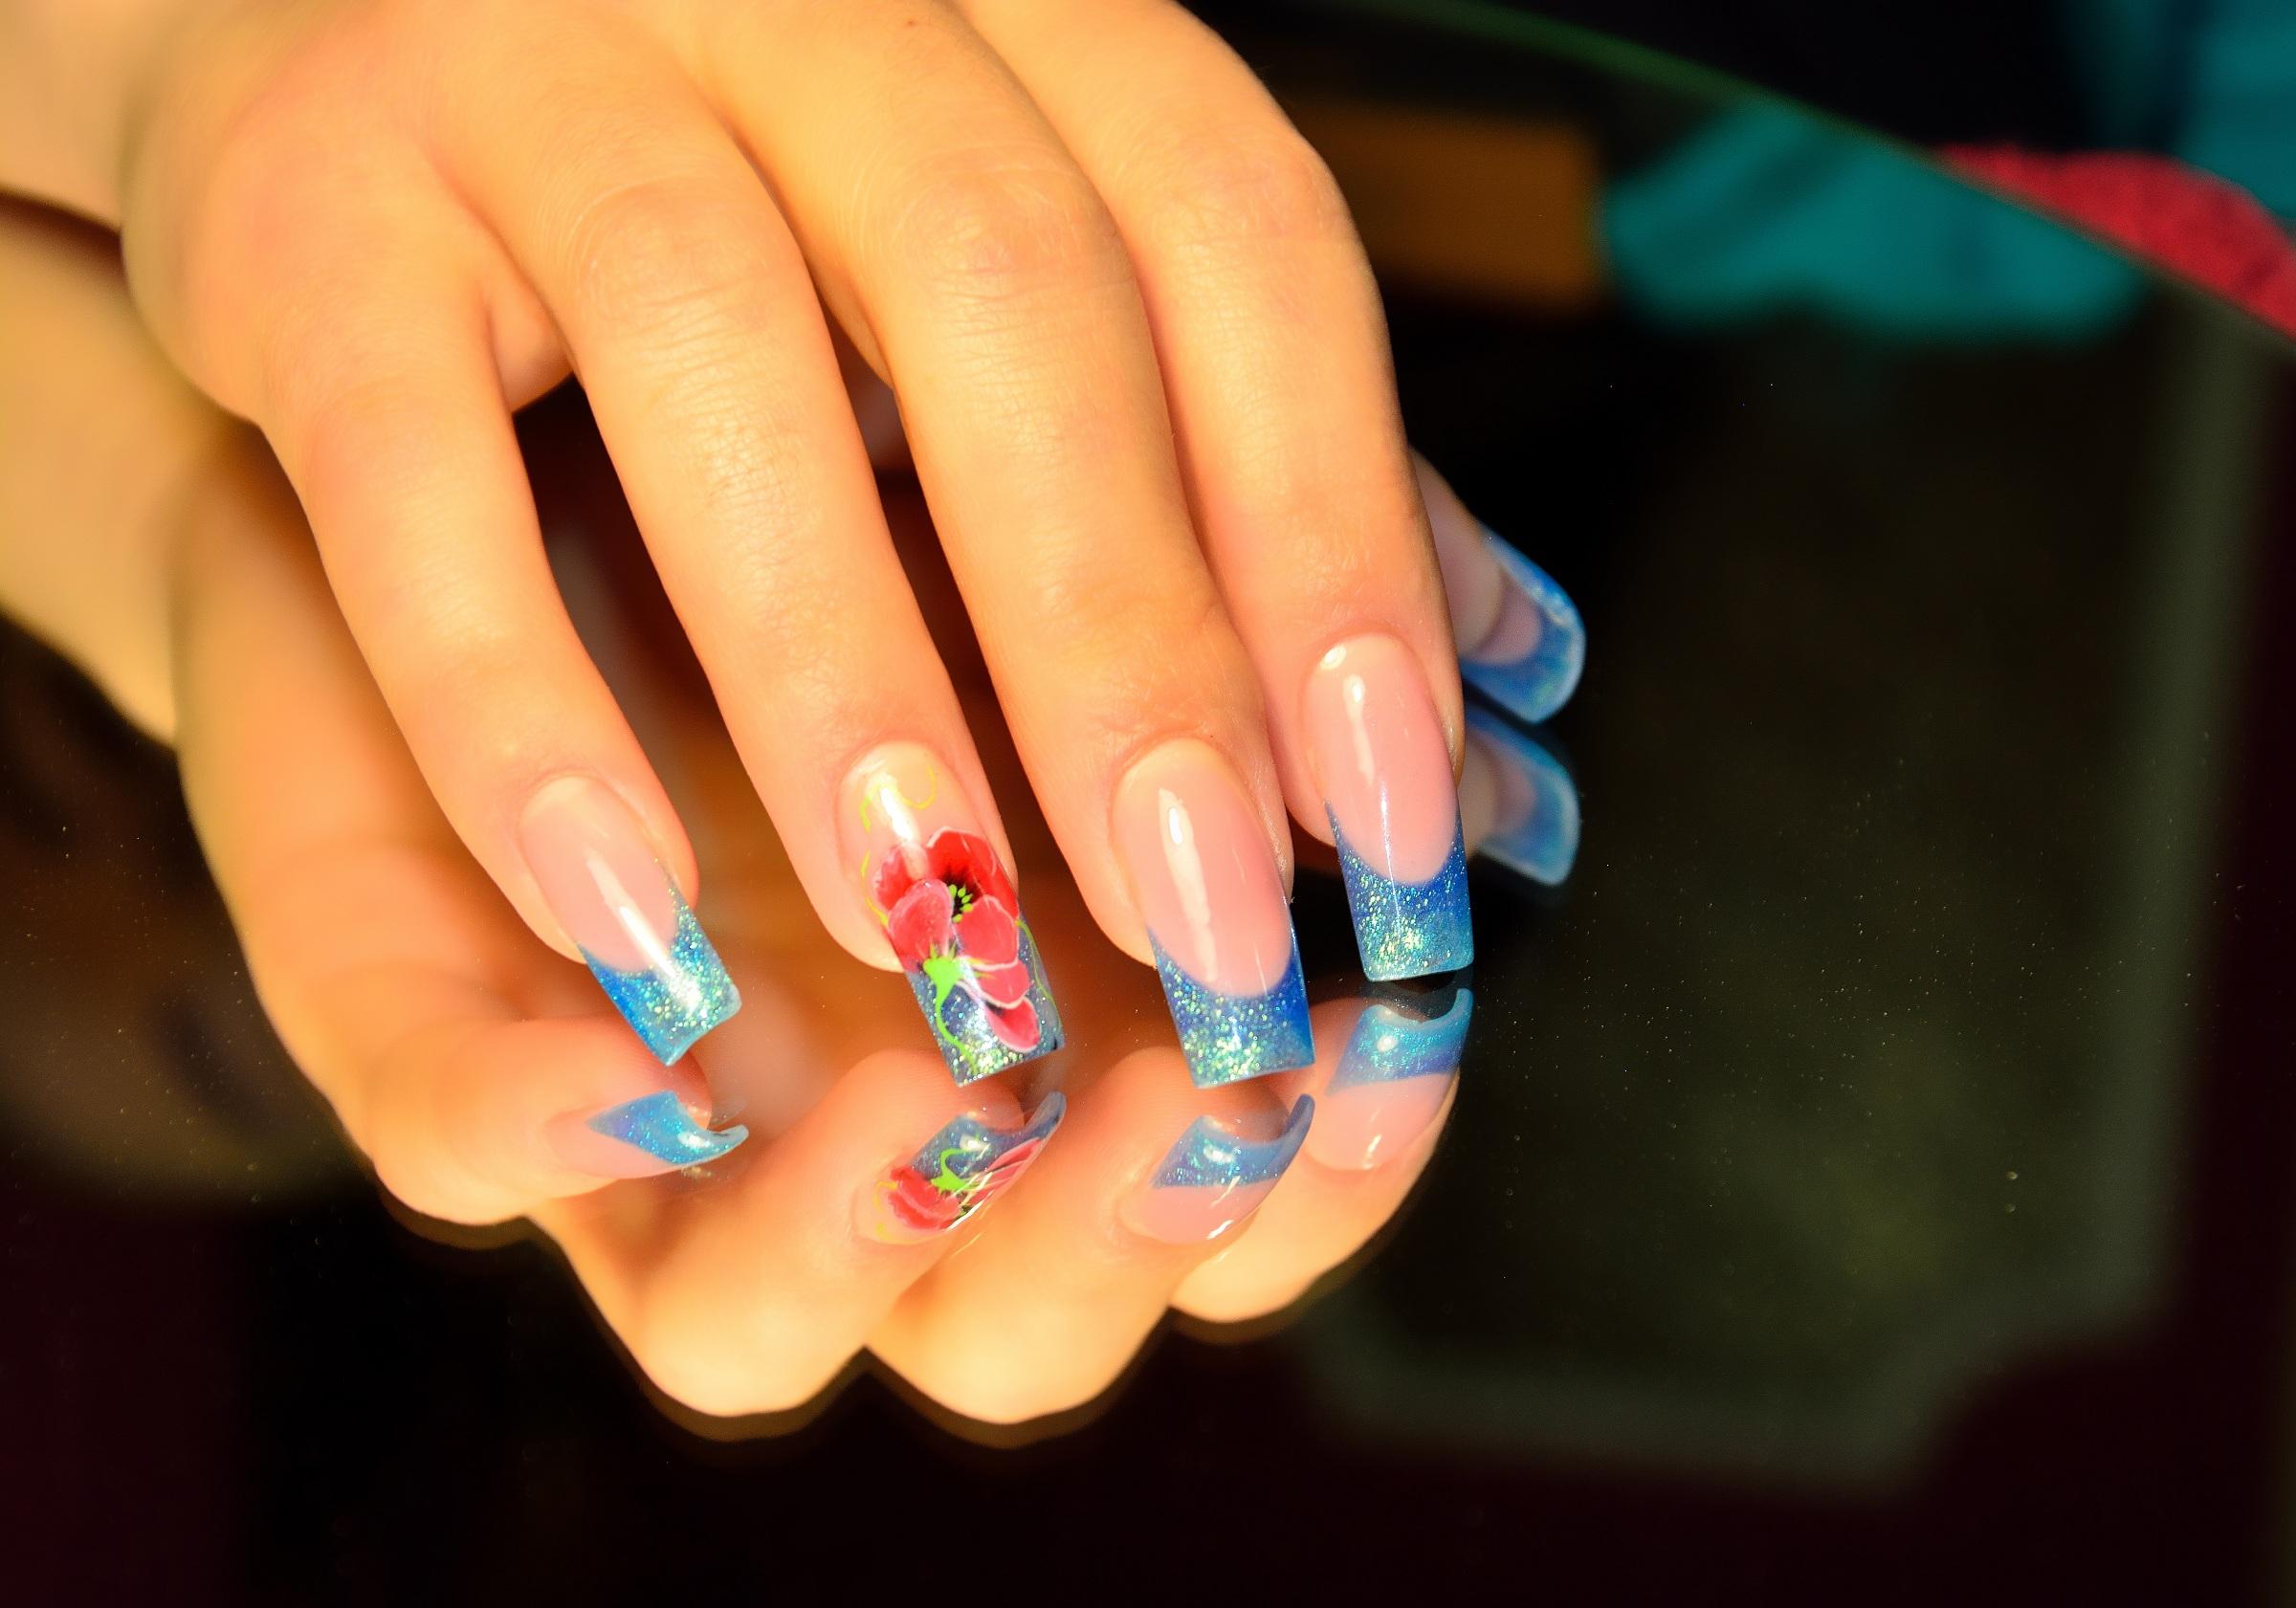 Arta unghiilor perfecte